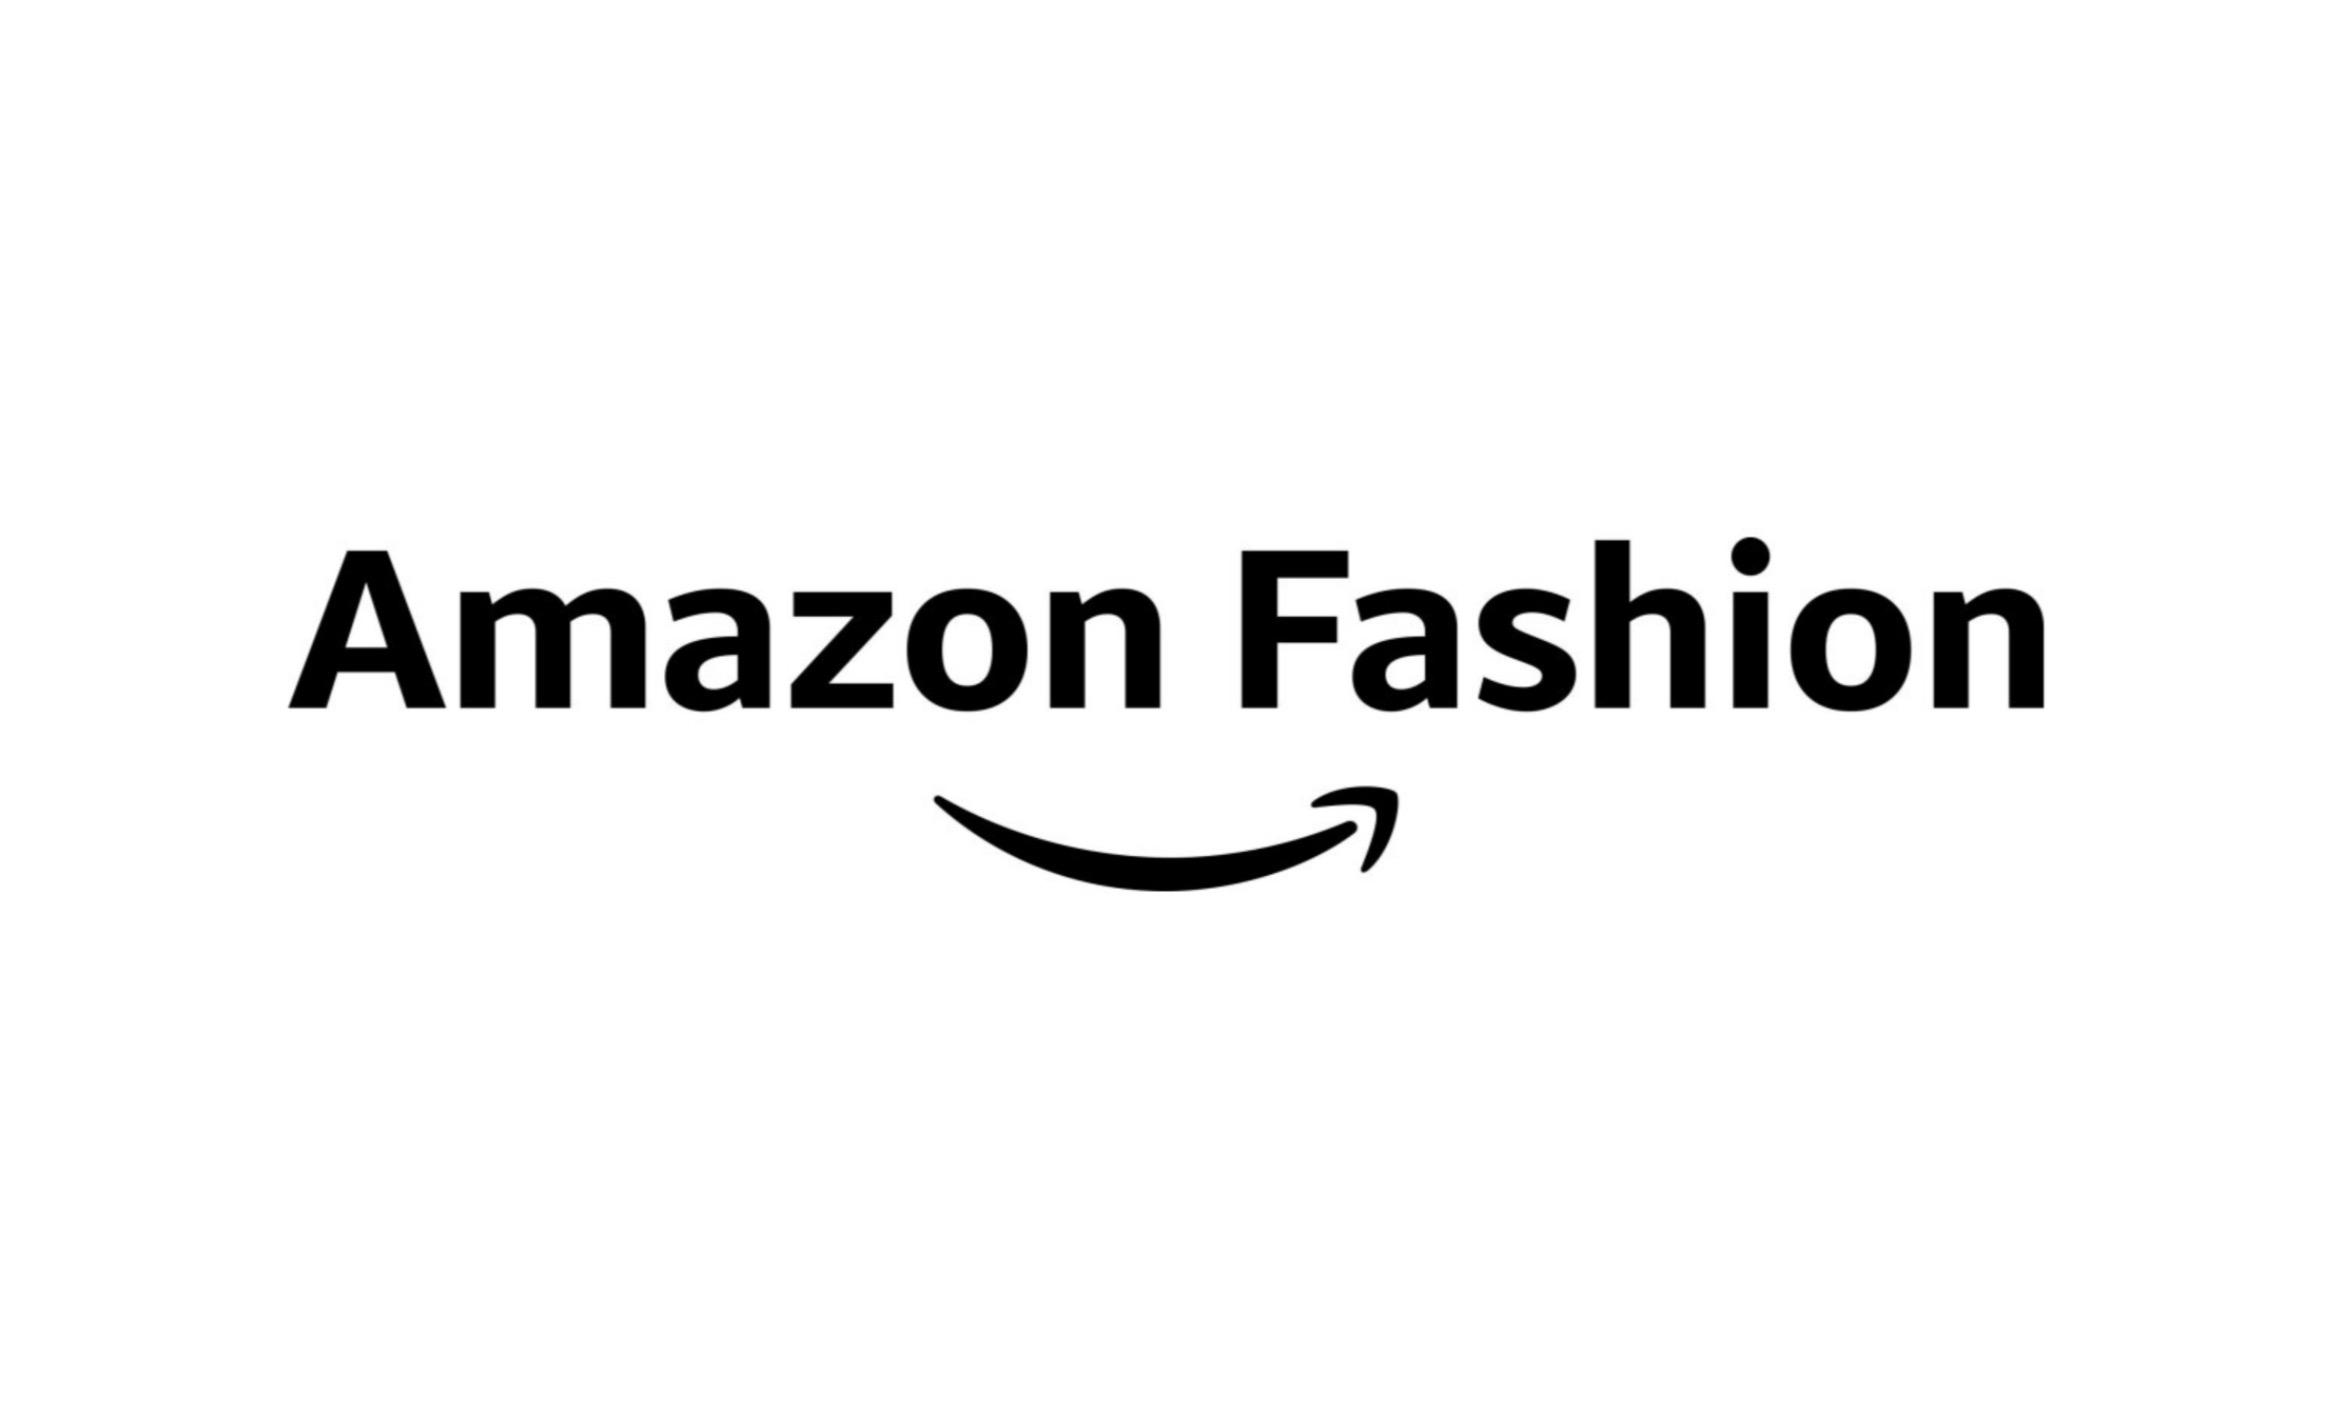 Amazon 欲扩大时尚版图,联手 PUMA 推出线上运动服装品牌 Care Of